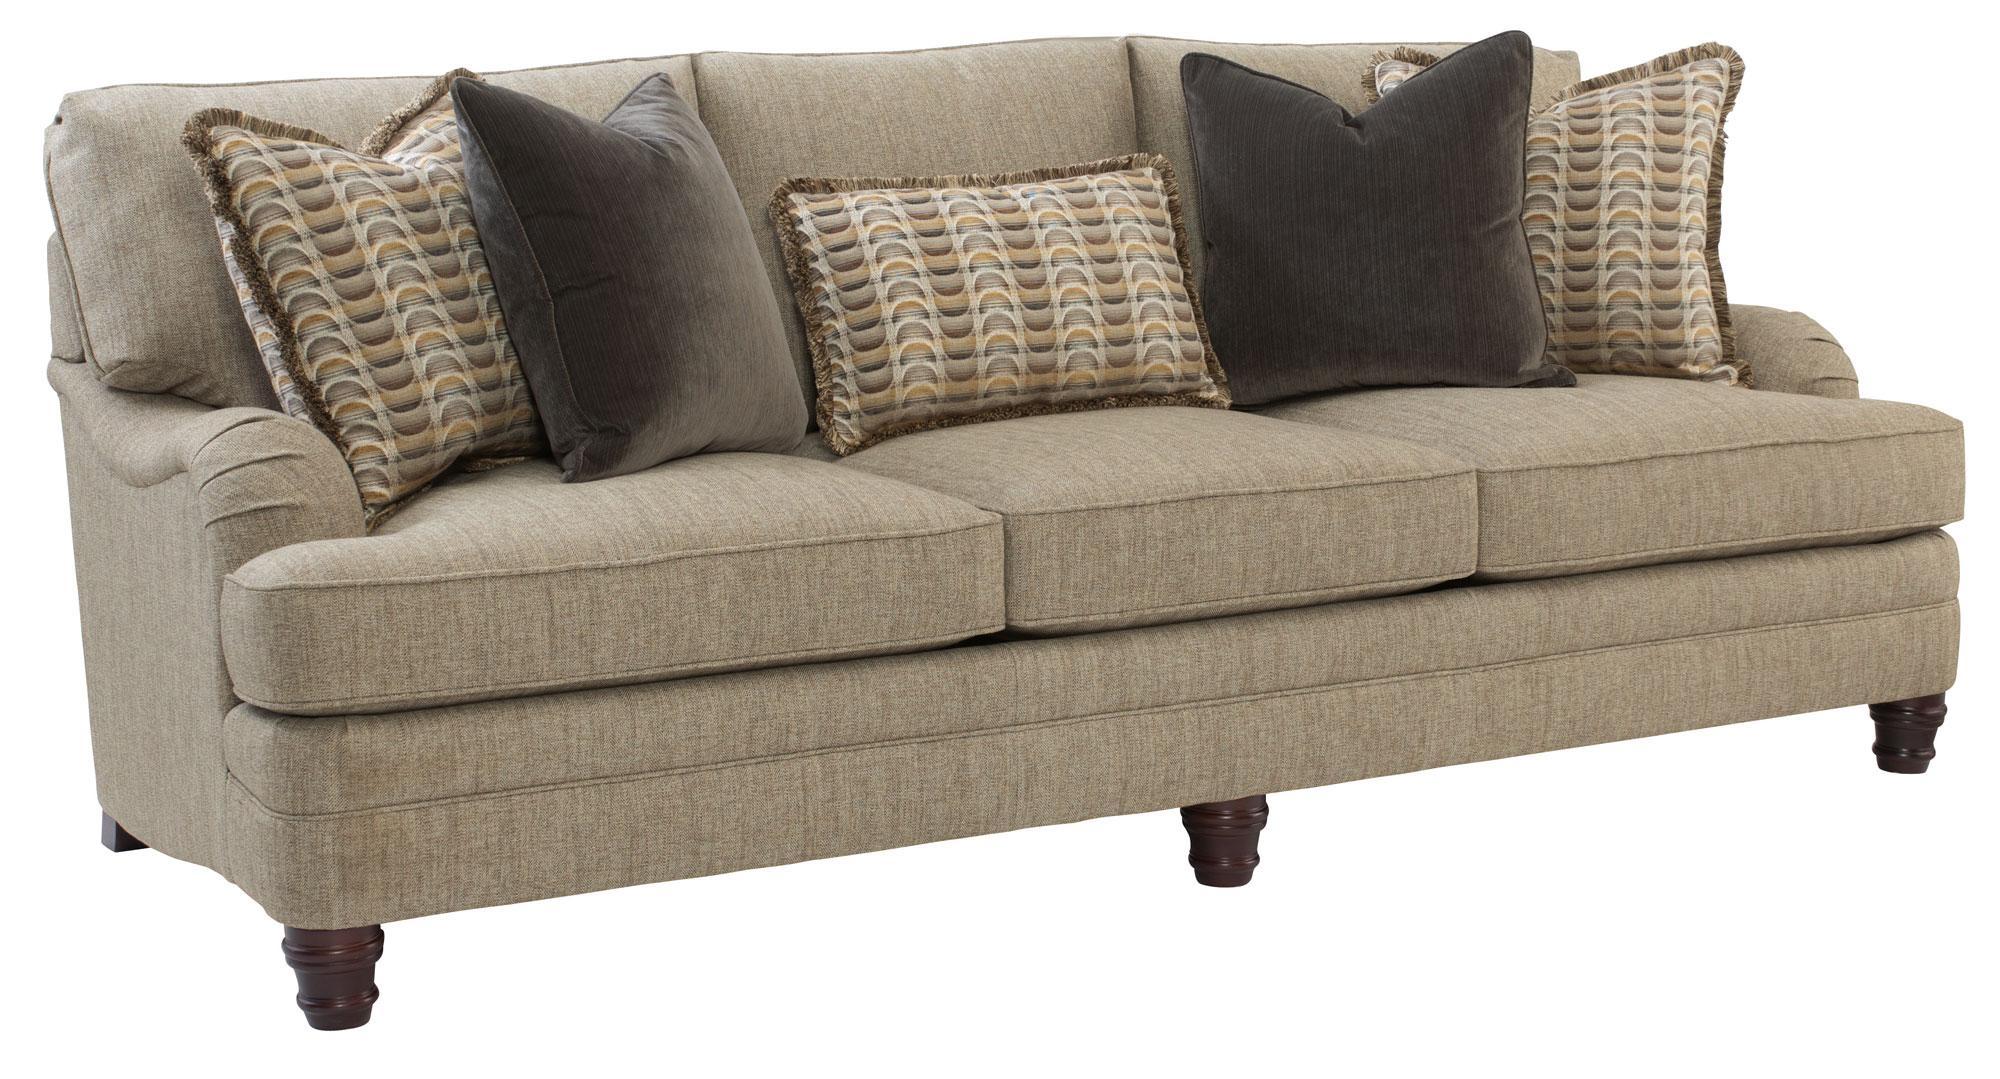 Featured Image of Bernhardt Tarleton Sofas